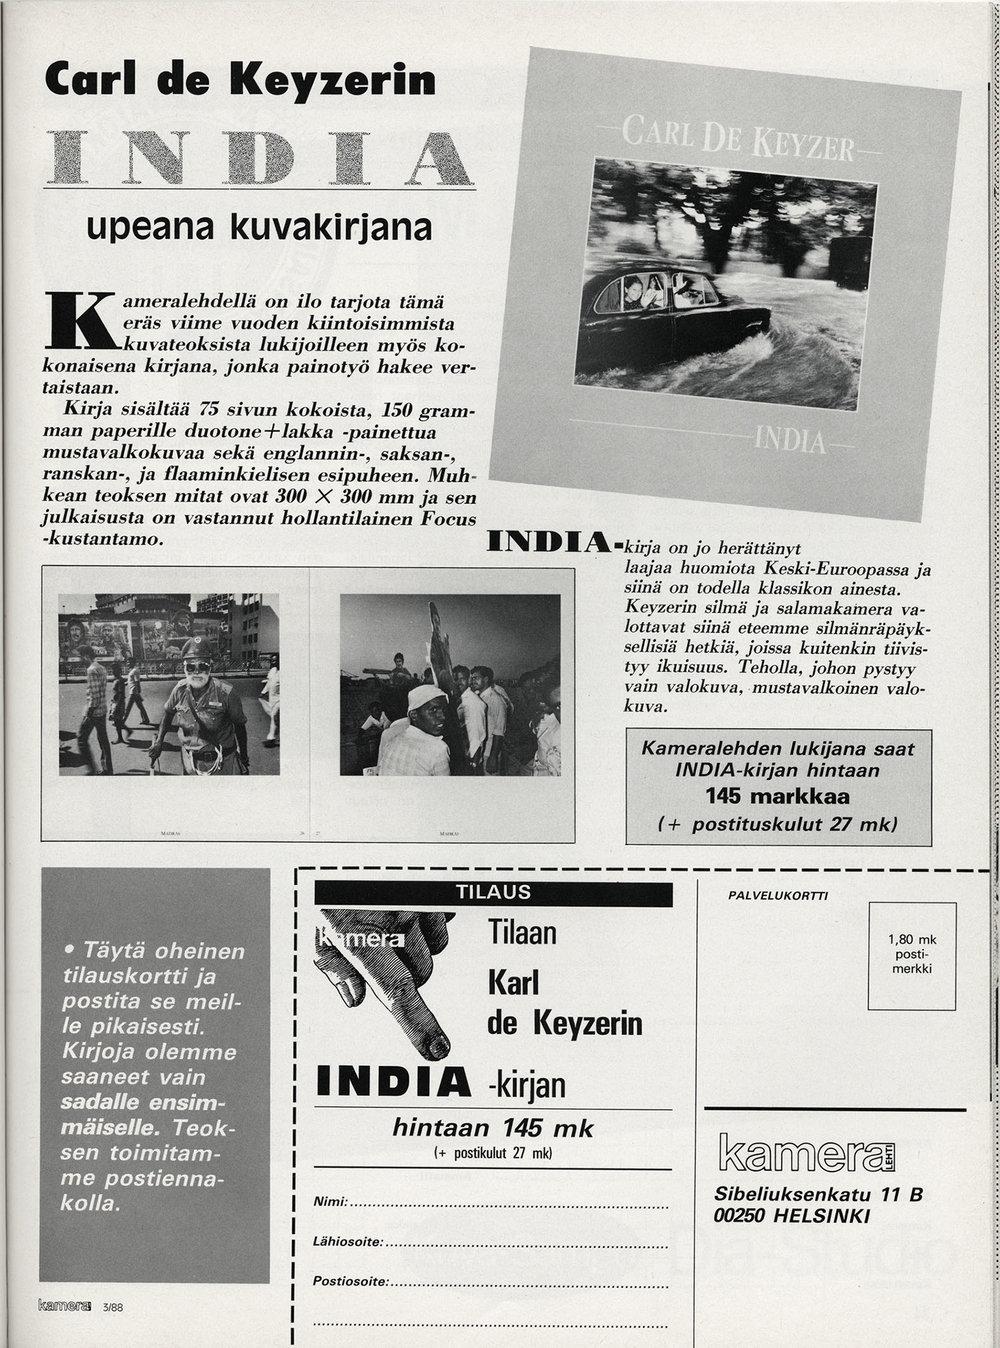 Kamera (India)